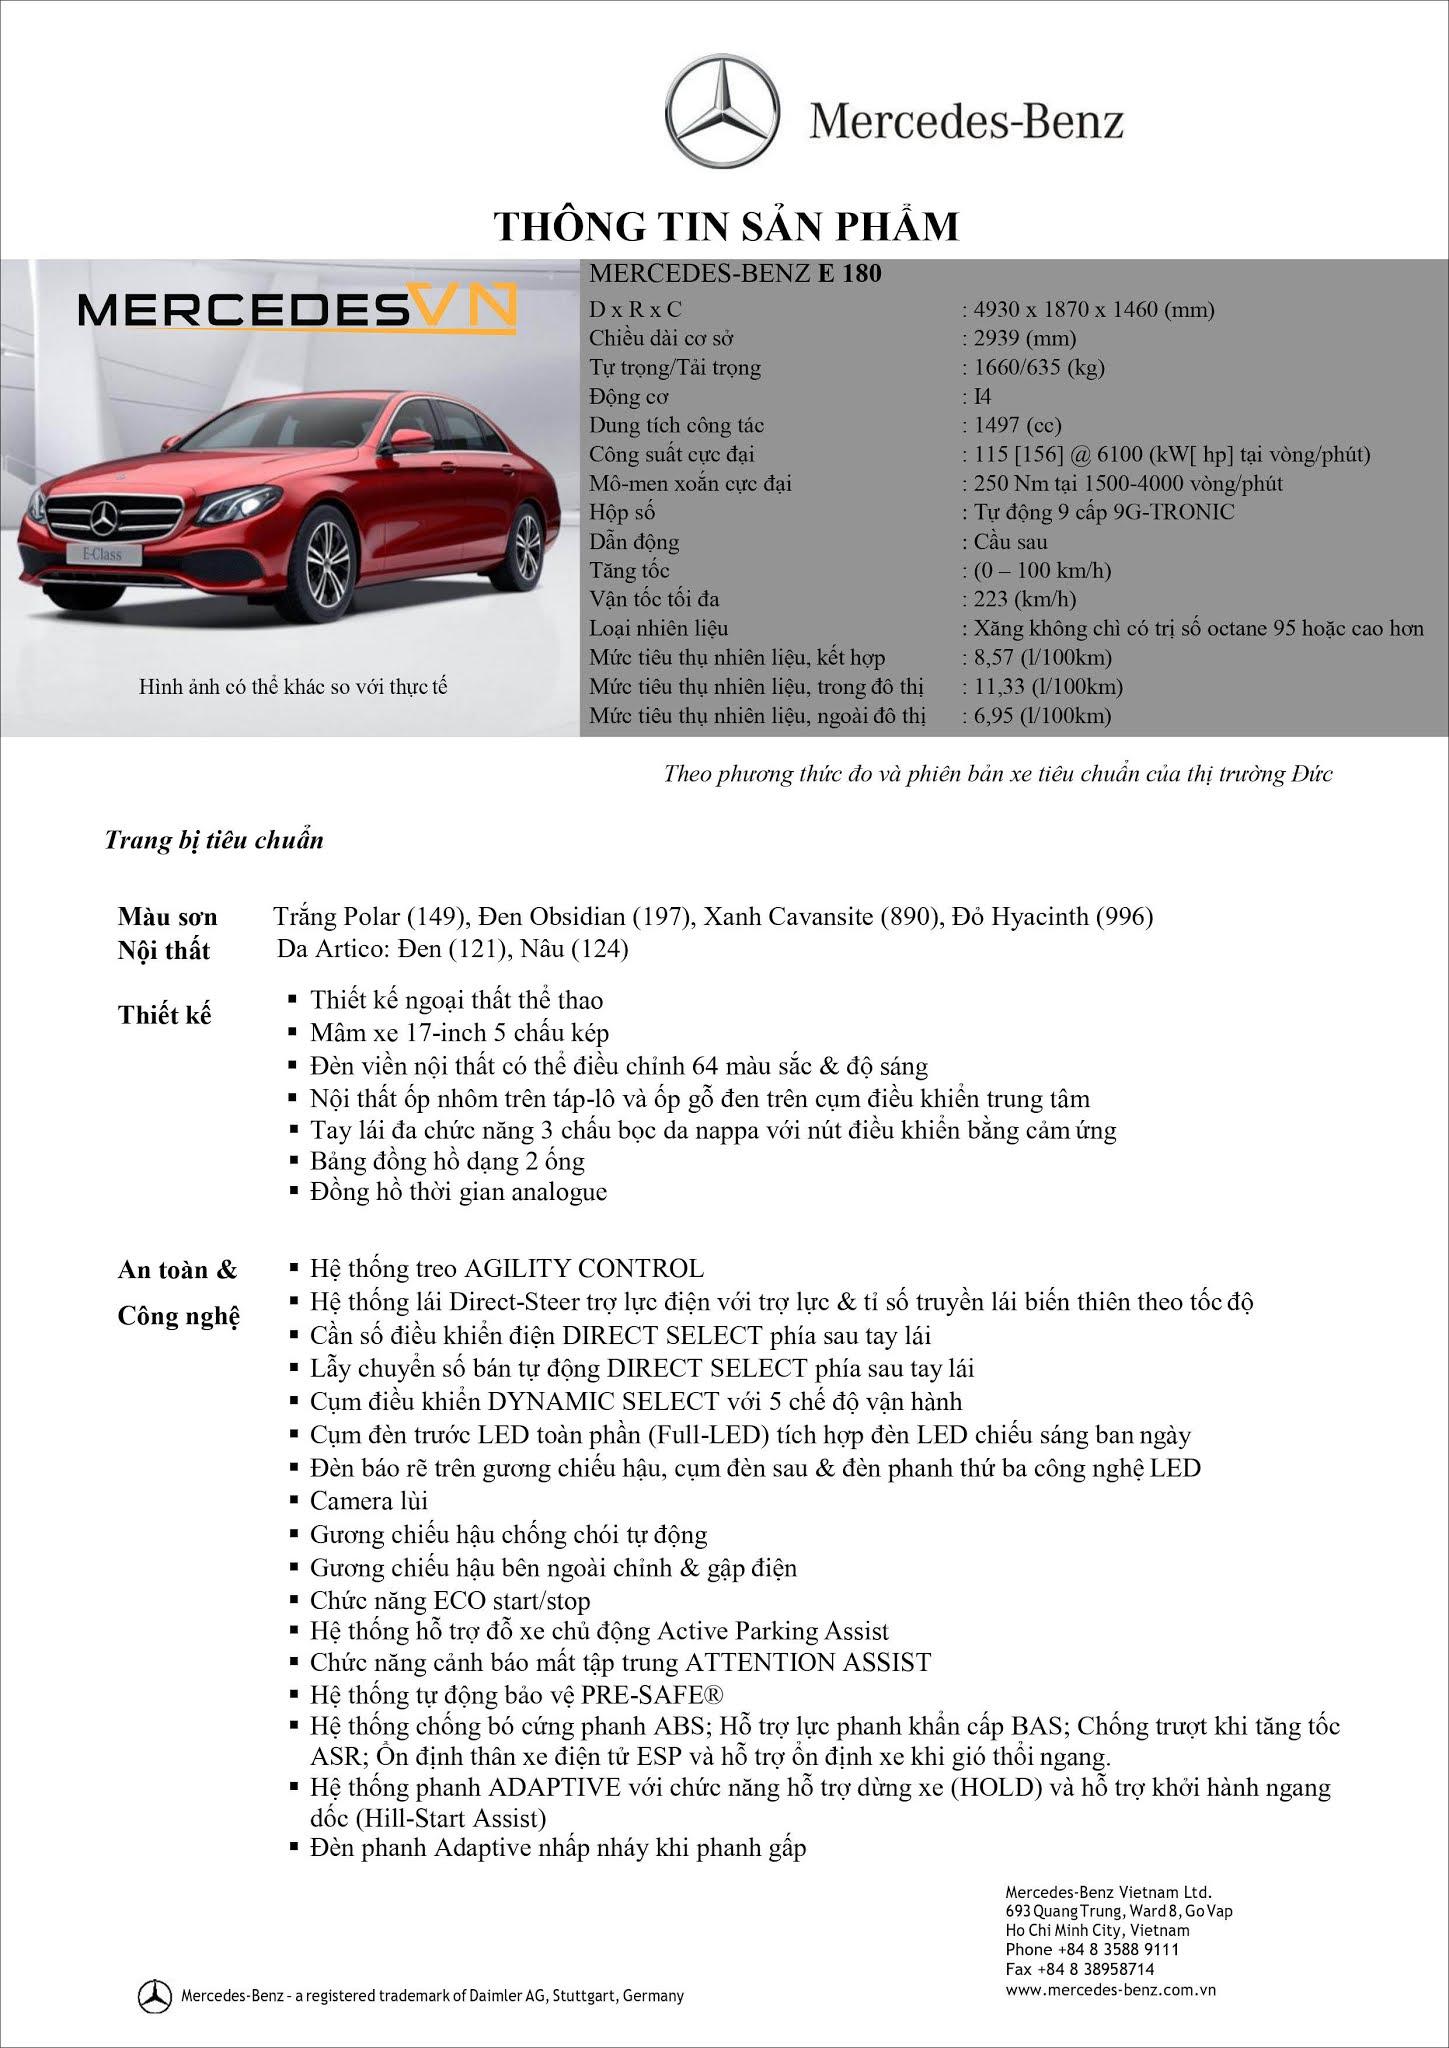 Bảng thông số kỹ thuật Mercedes E180 2021